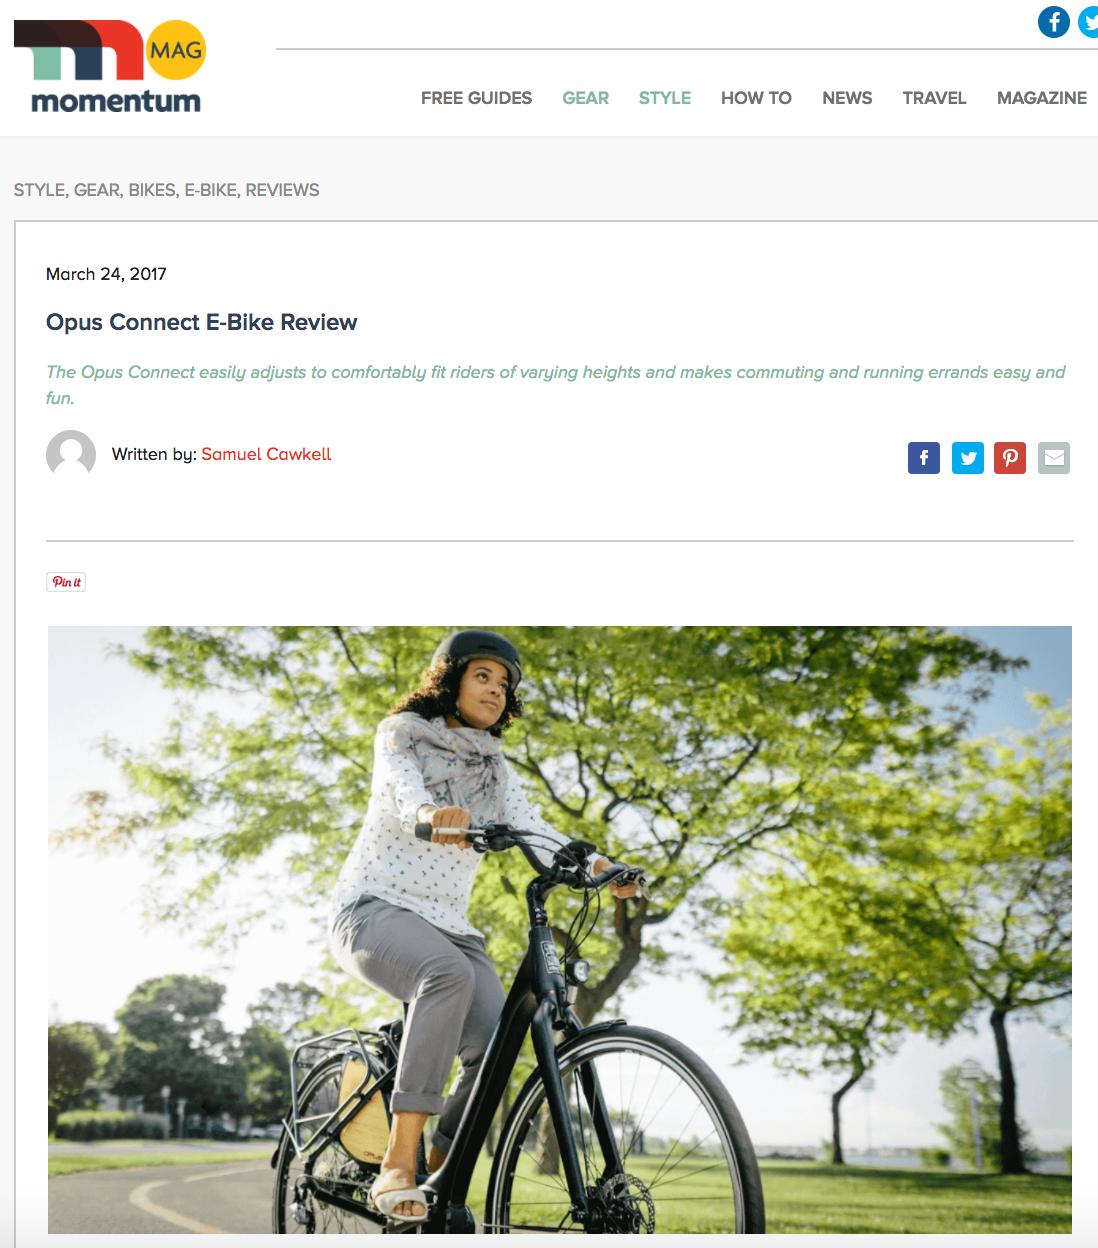 Photo:https://momentummag.com/opus-connect-e-bike-review/